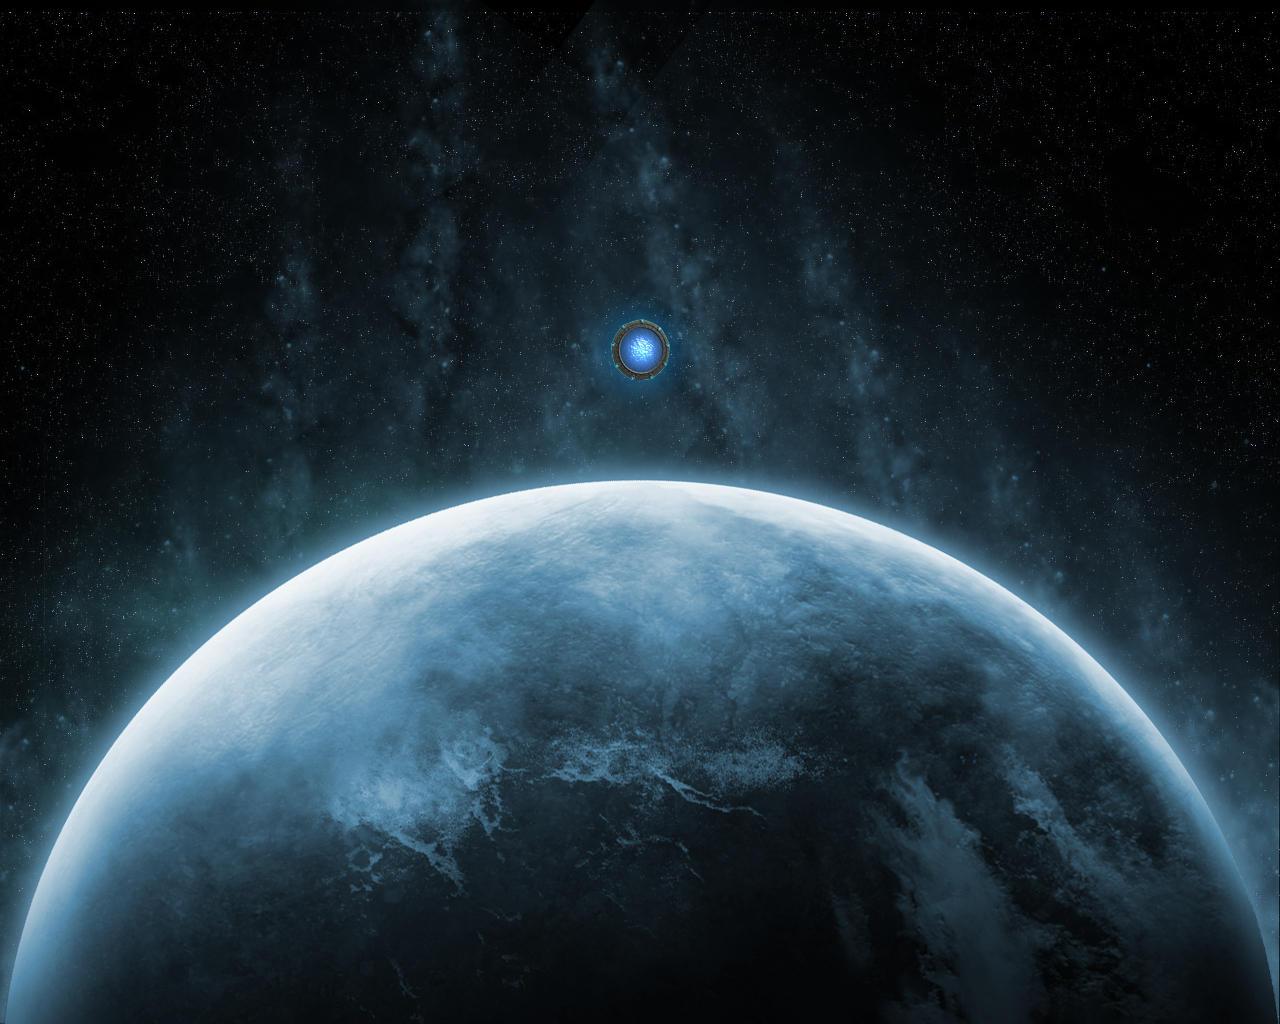 Stargate Creation by sirdar